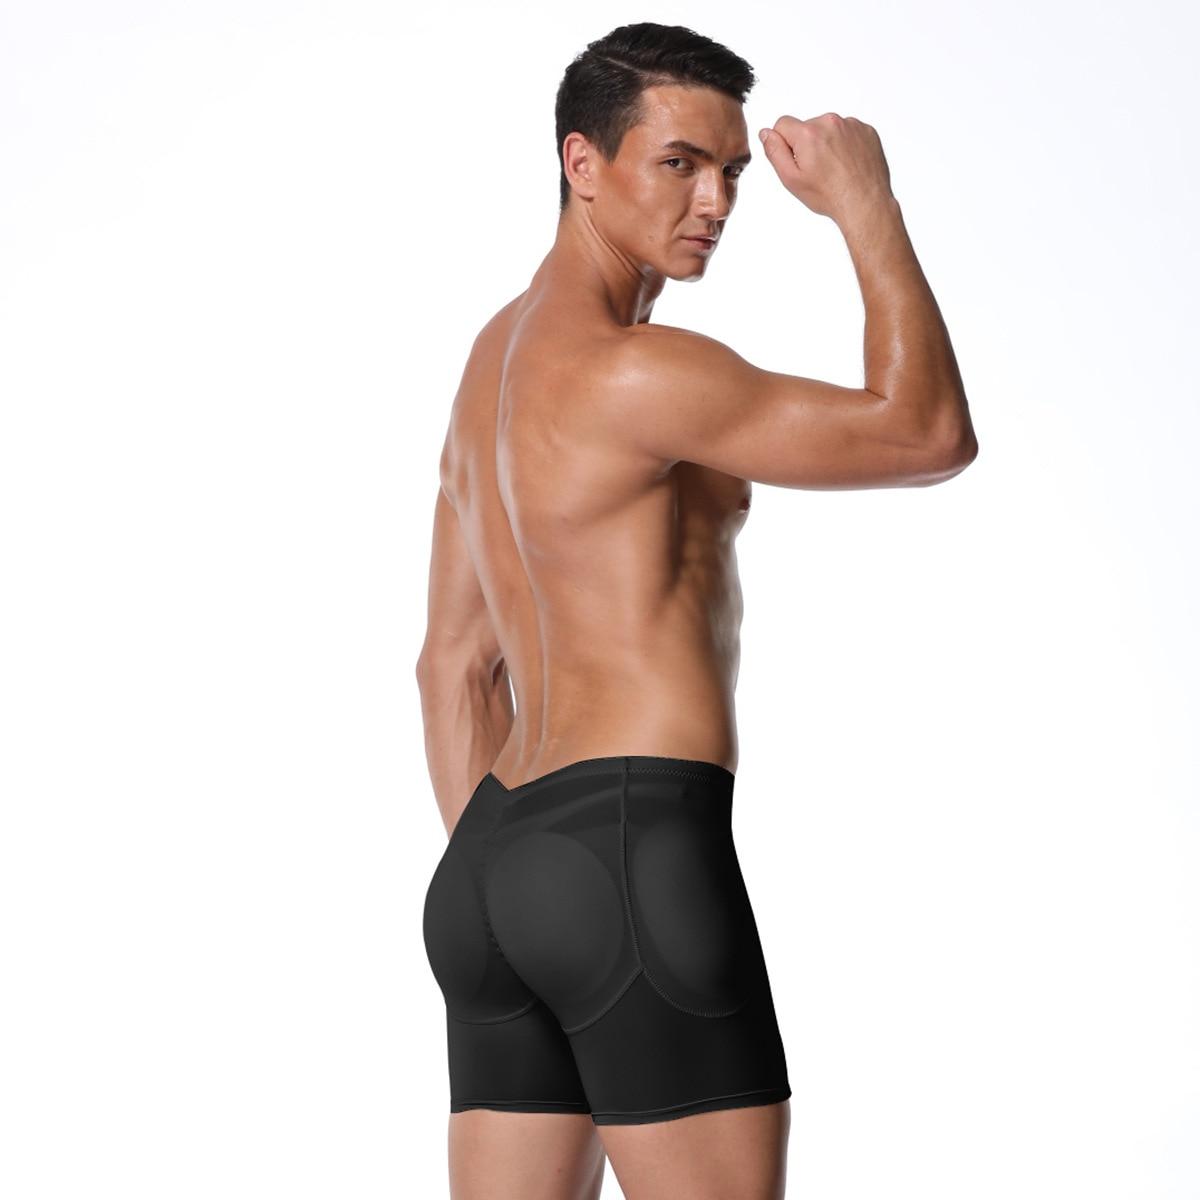 Slimming Shorts Underwear Men Butt Enhancer High Waist Body Shaper Panties Seamless Tummy Control Pants Shapewear Plus Size 6XL